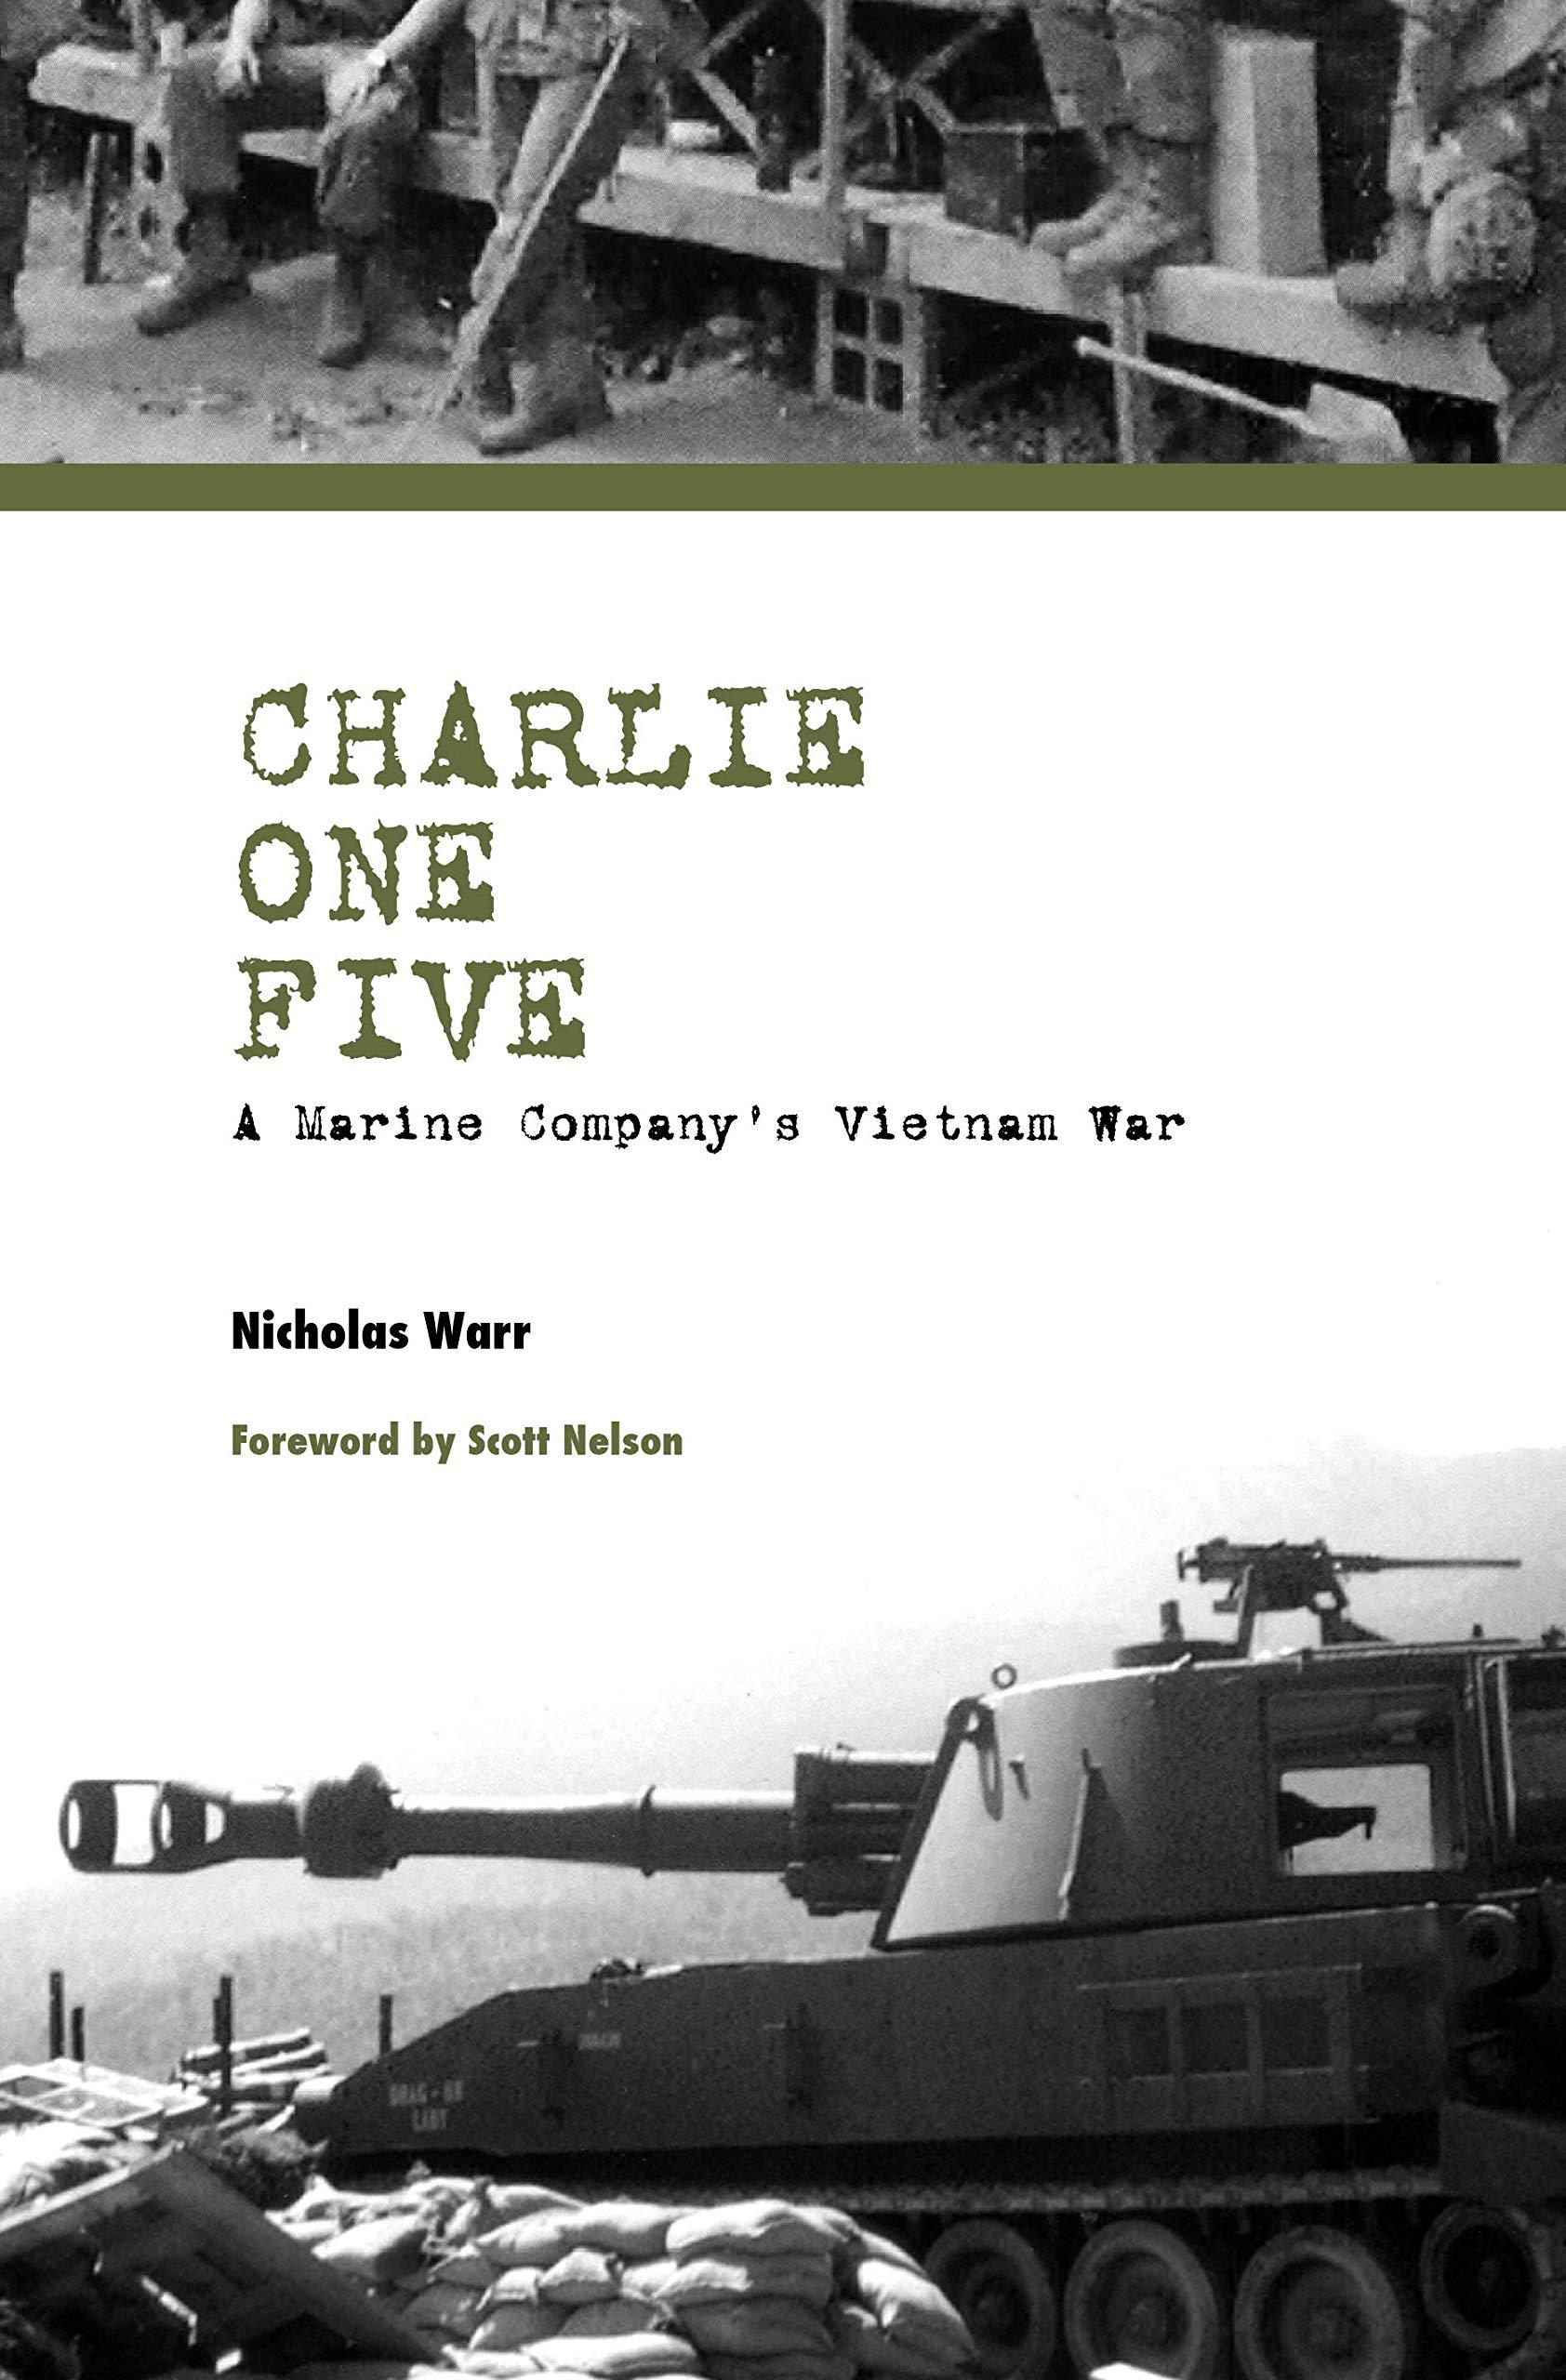 Charlie One Five: A Marine Company's Vietnam War (Modern Southeast Asia) by Brand: Texas Tech University Press